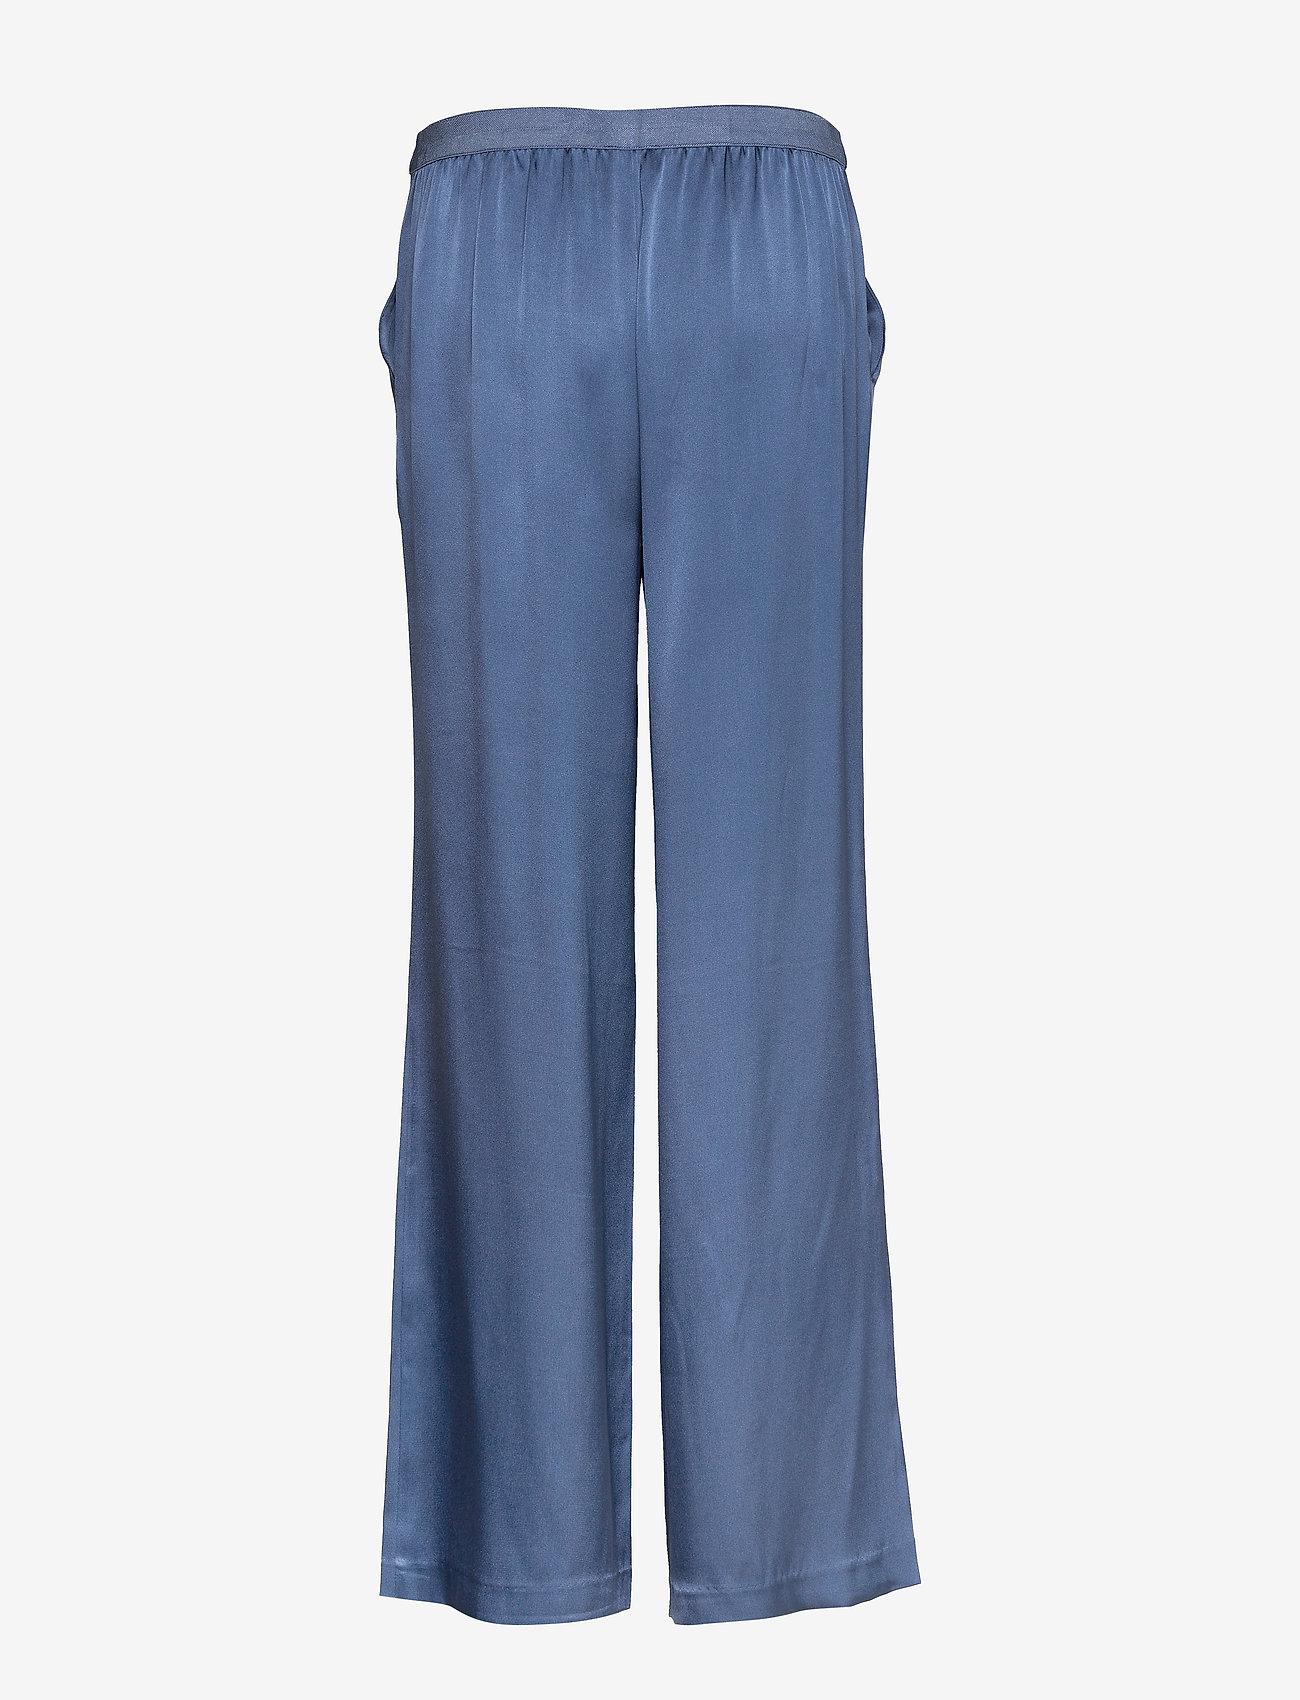 SAND - Double Silk - Sasha Flex Pleated - uitlopende broeken - medium blue - 1